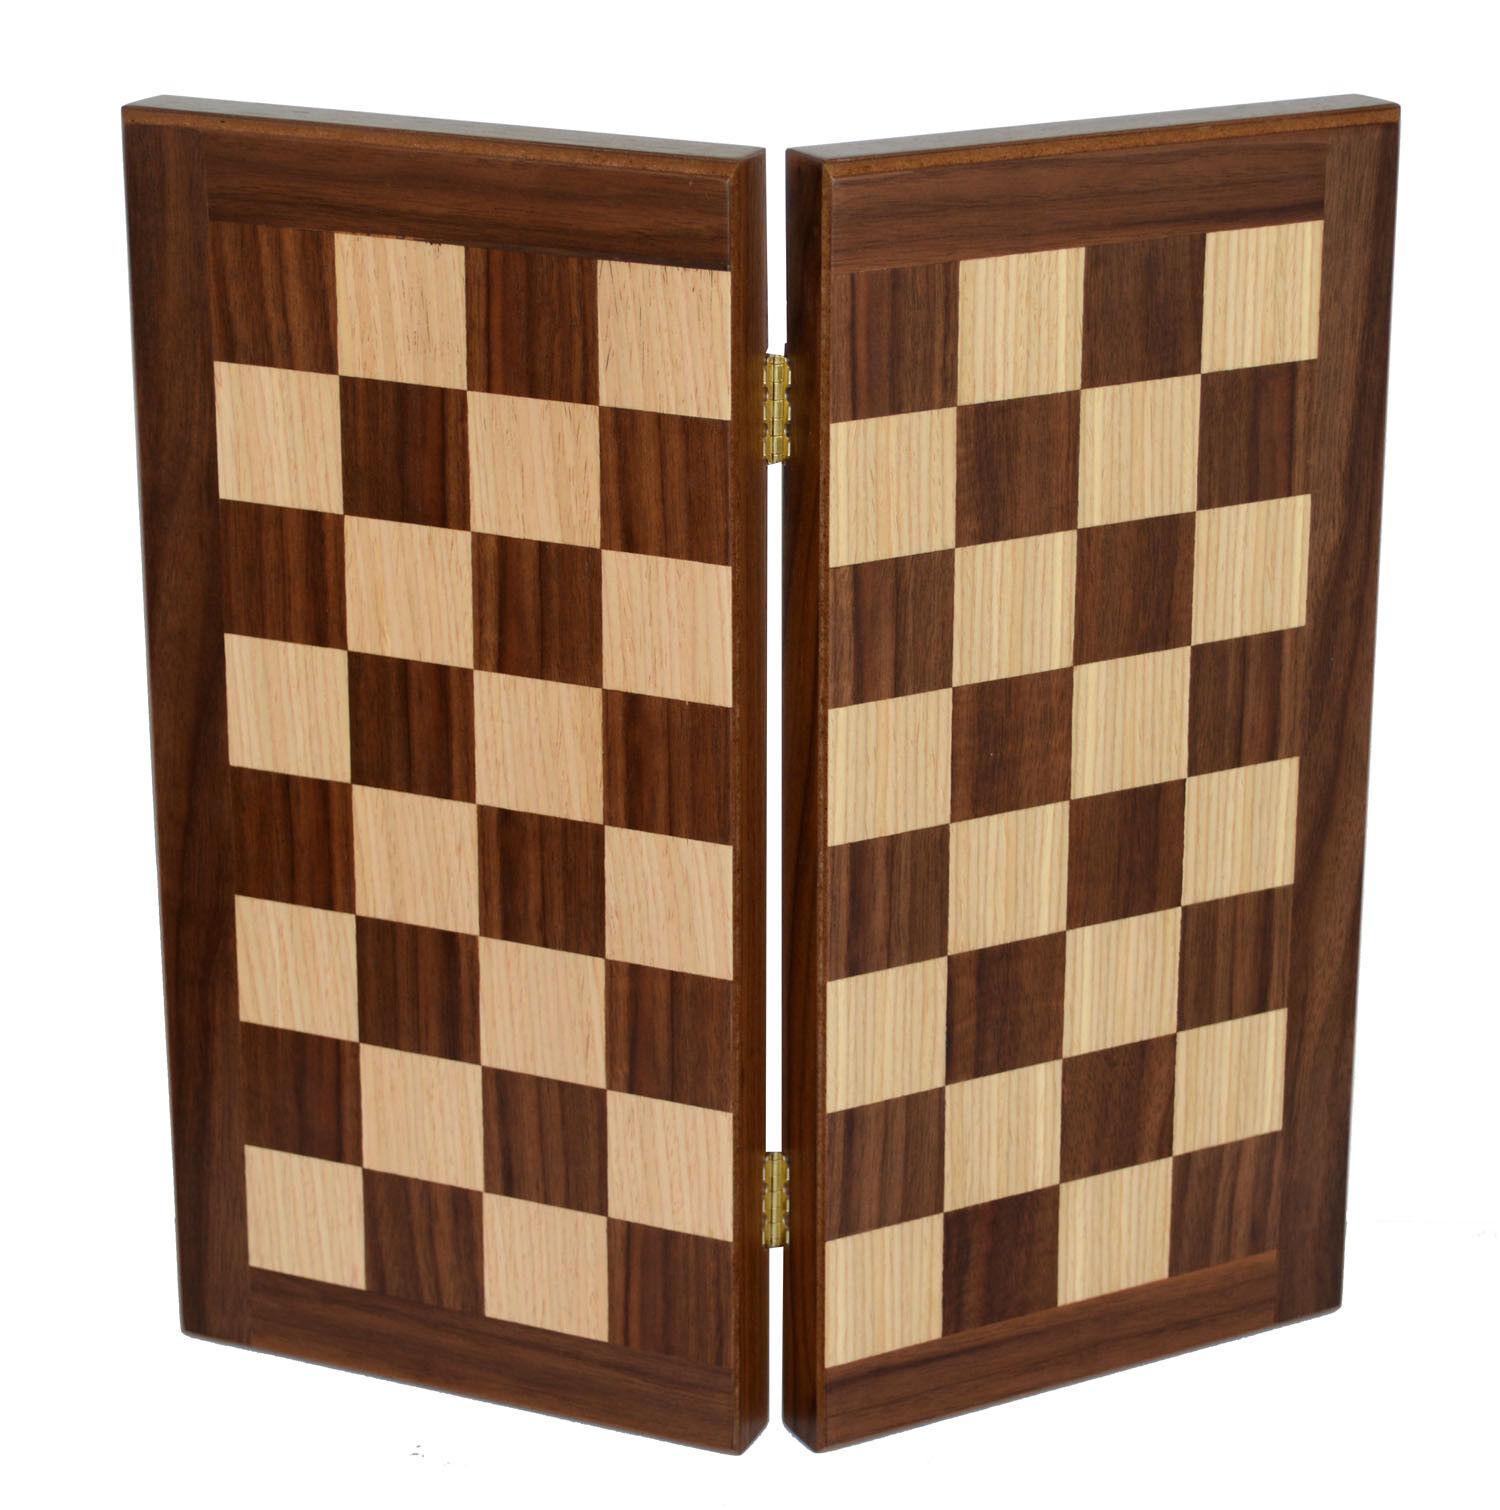 Traditional 15  Walnut Backgammon Backgammon Backgammon Chess Set by Manopoulos - Without chess pawns cb6550